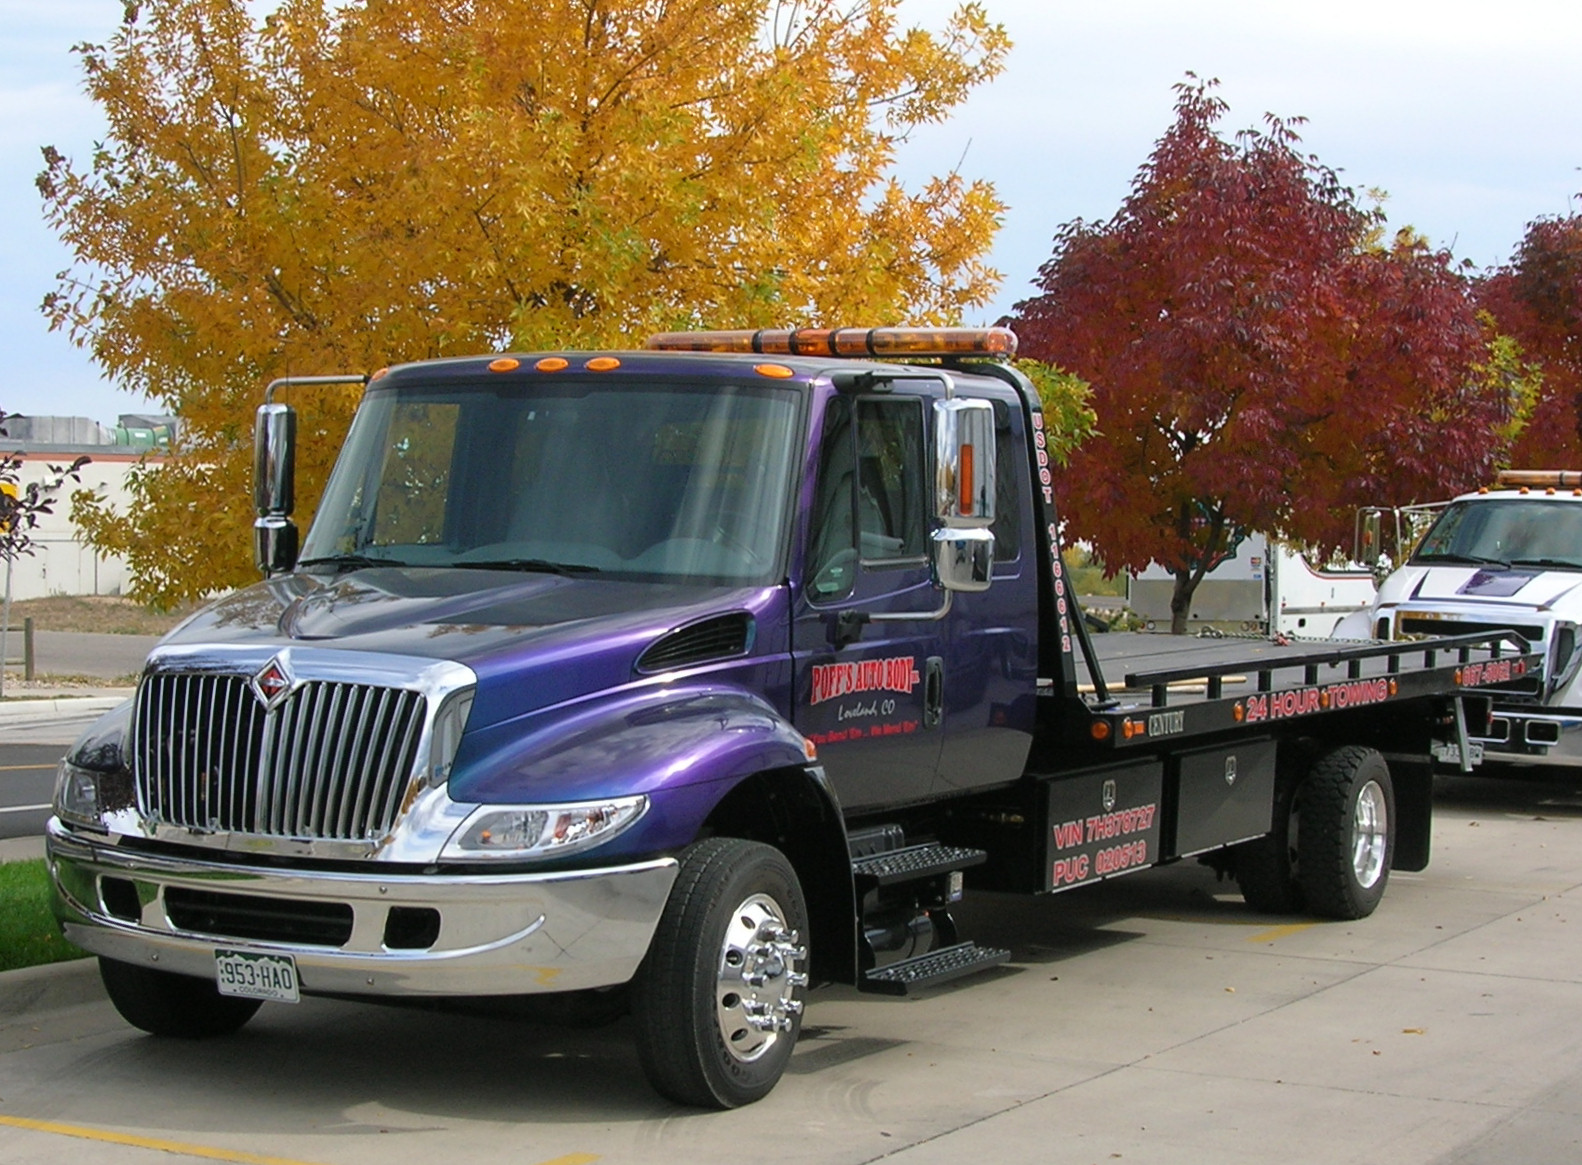 Tow truck. (Credit: Greg Goebel/Flickr/File Photo)